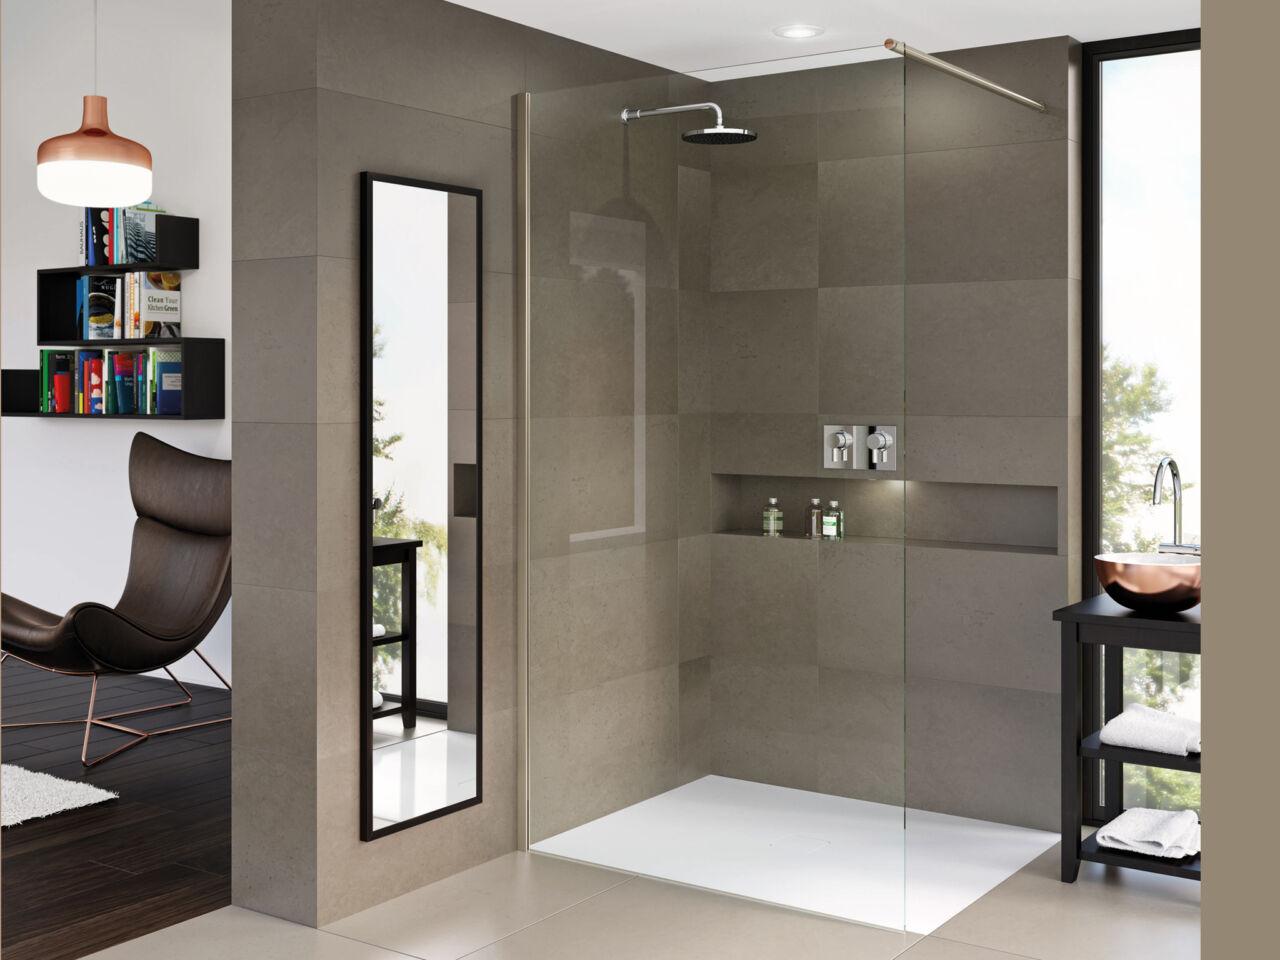 Matki-ONE Wet Room Panel with Wall Brace Bar - Matki